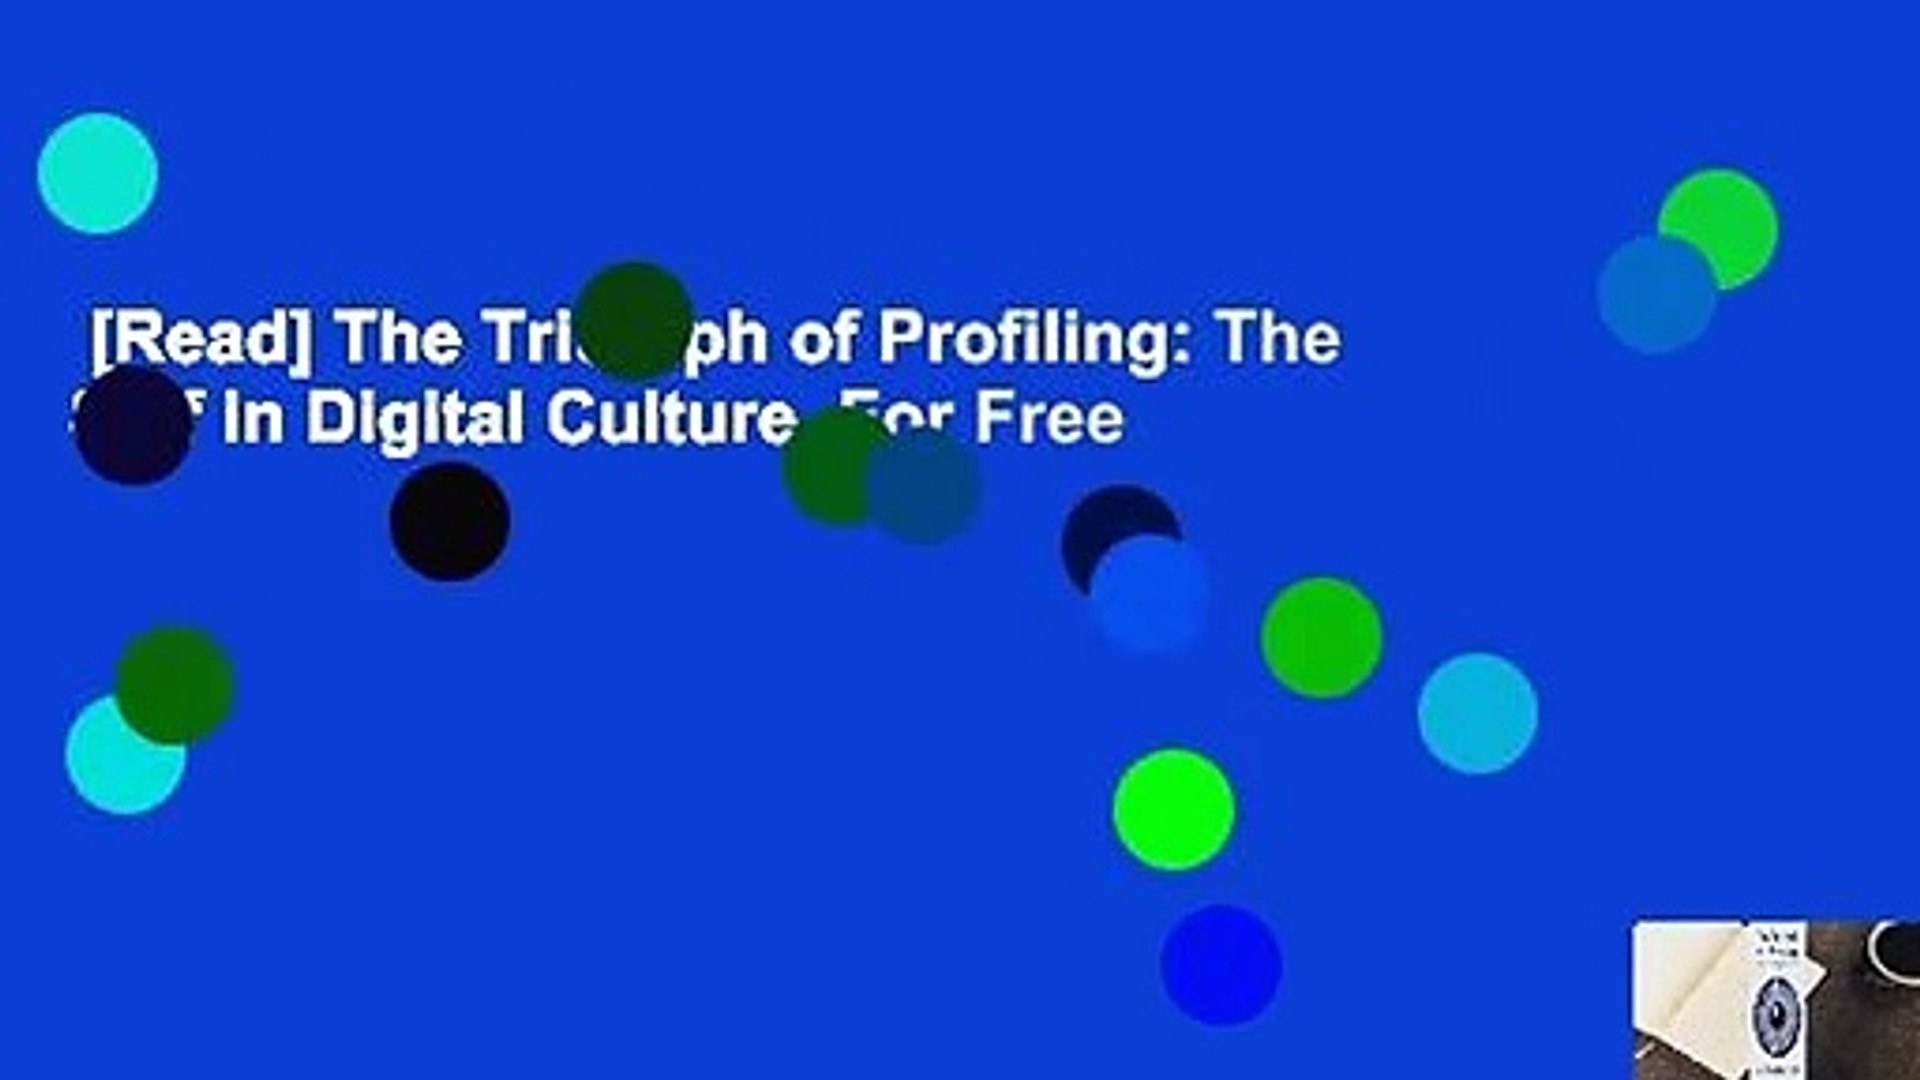 Postfeminist Digital Cultures Femininity Social Media and Self-Representation